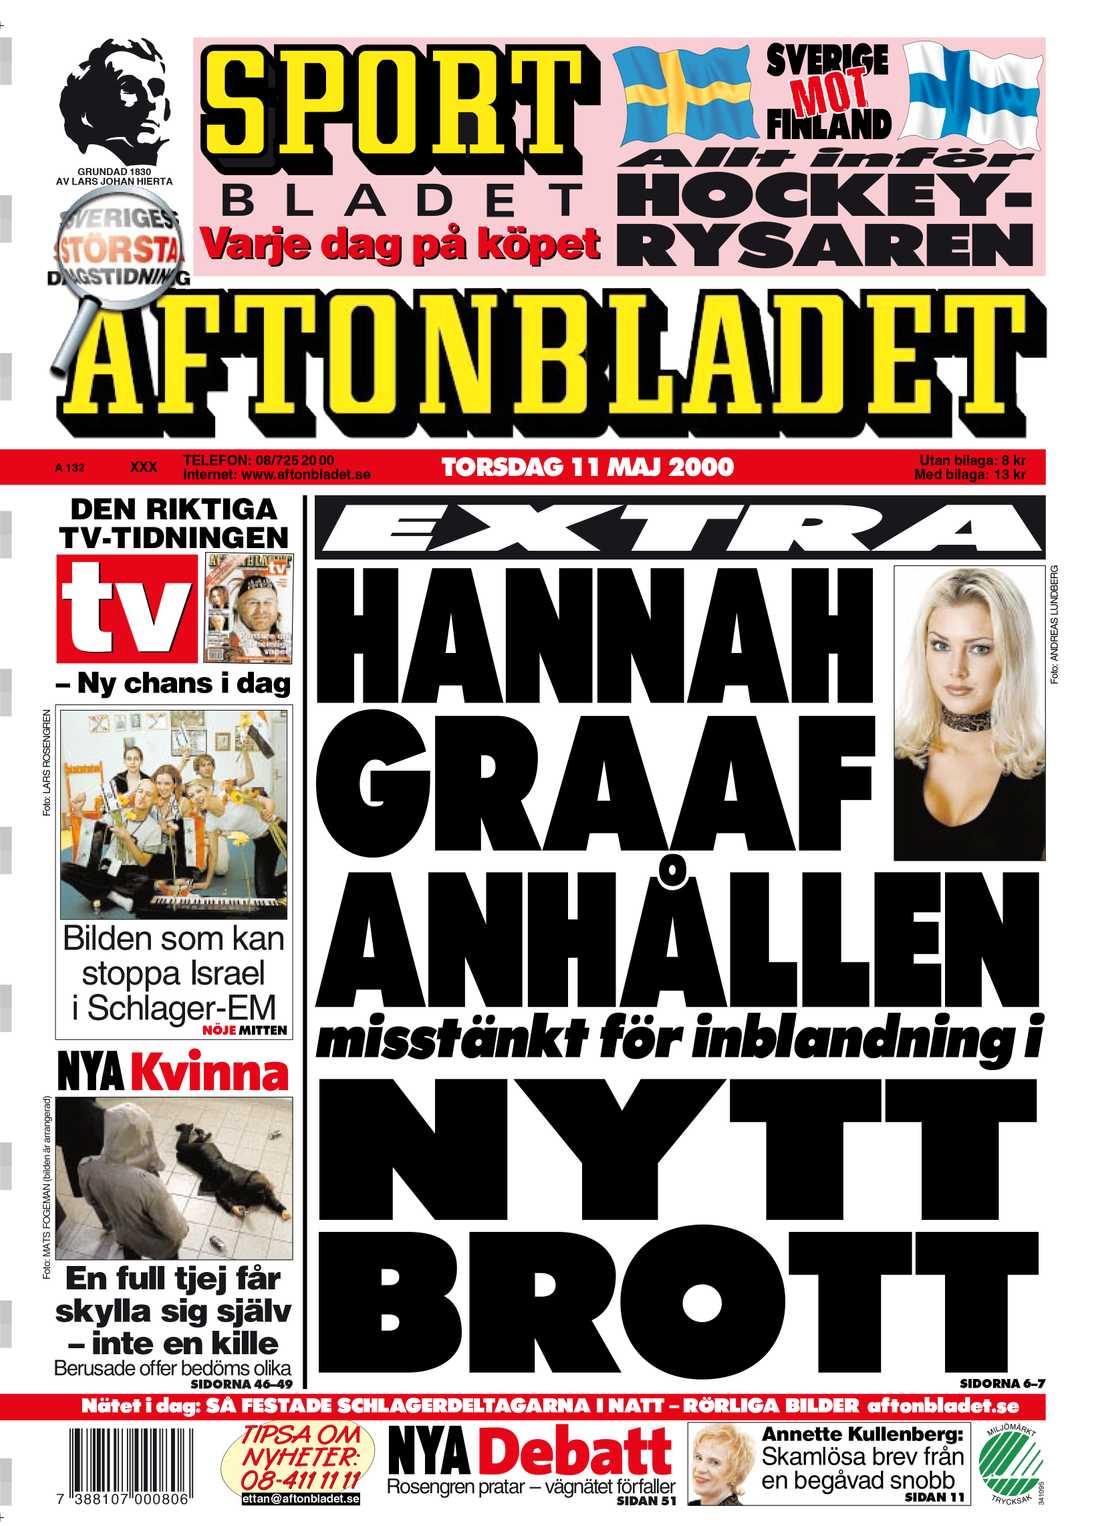 Aftonbladet torsdag 11 maj 2000